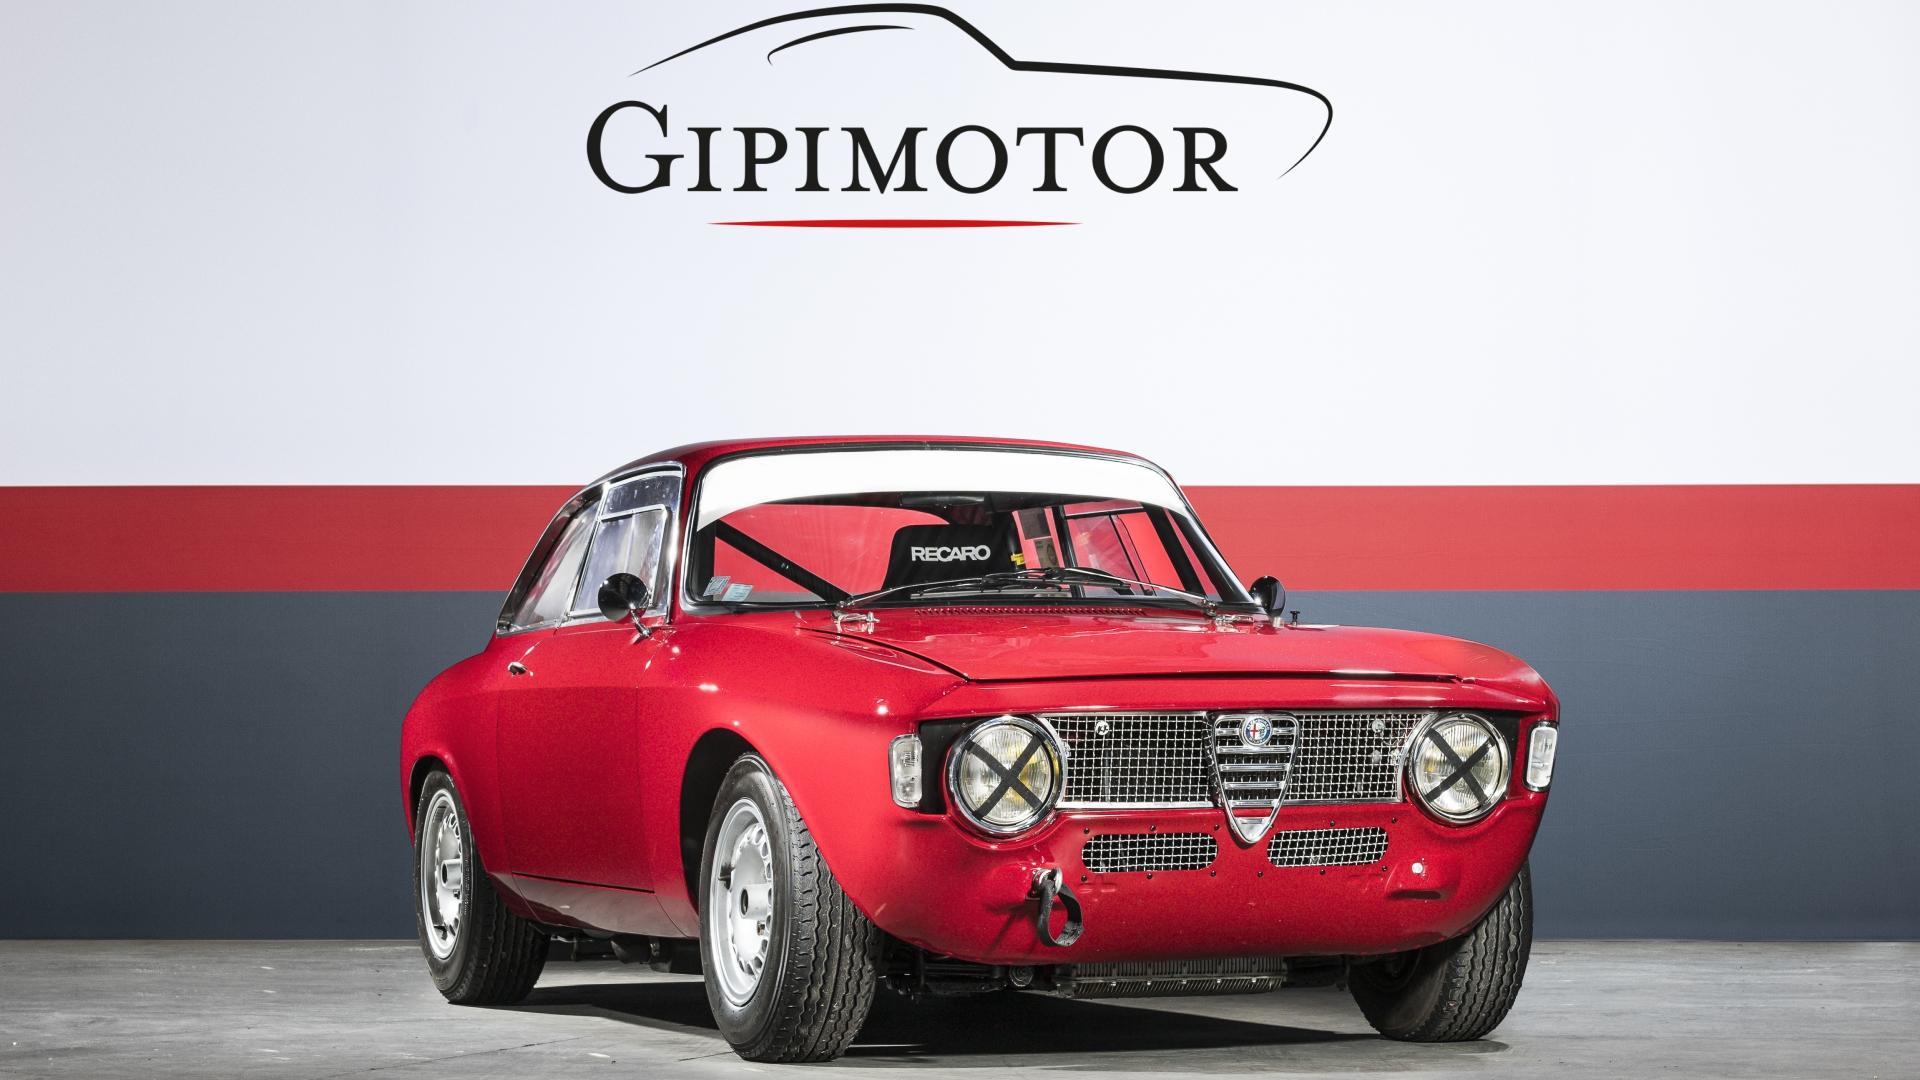 Alfa Romeo - GTA · Gipimotor